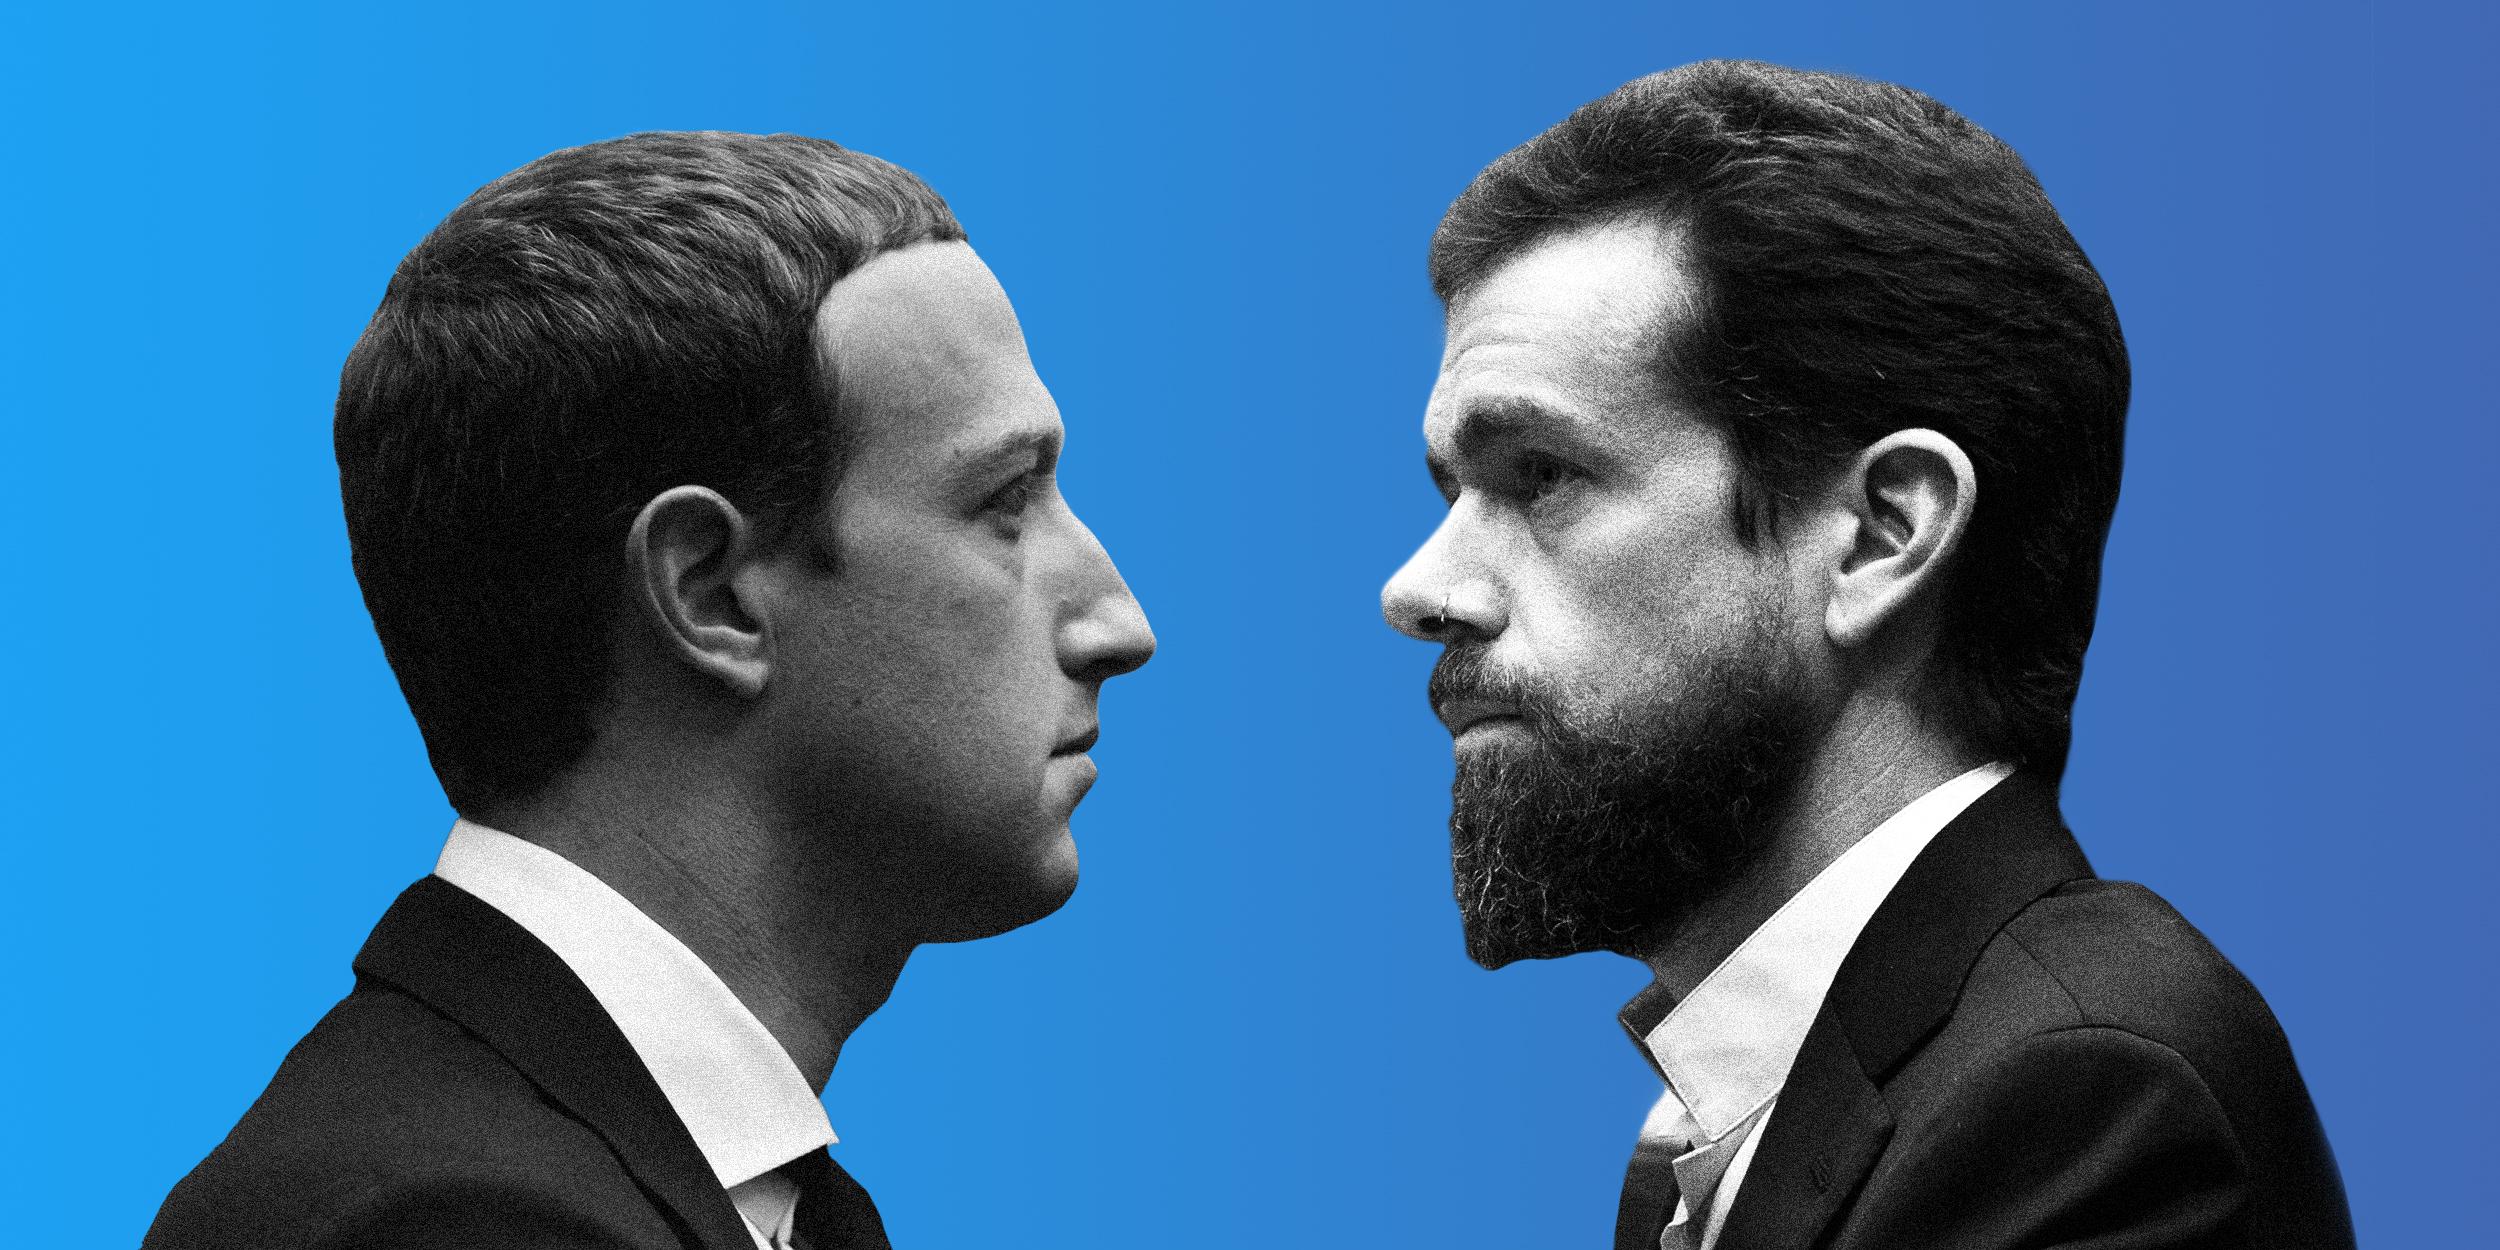 Jack Dorsey Vs Mark Zuckerberg Why The Clash Of The Tech Titans Matters